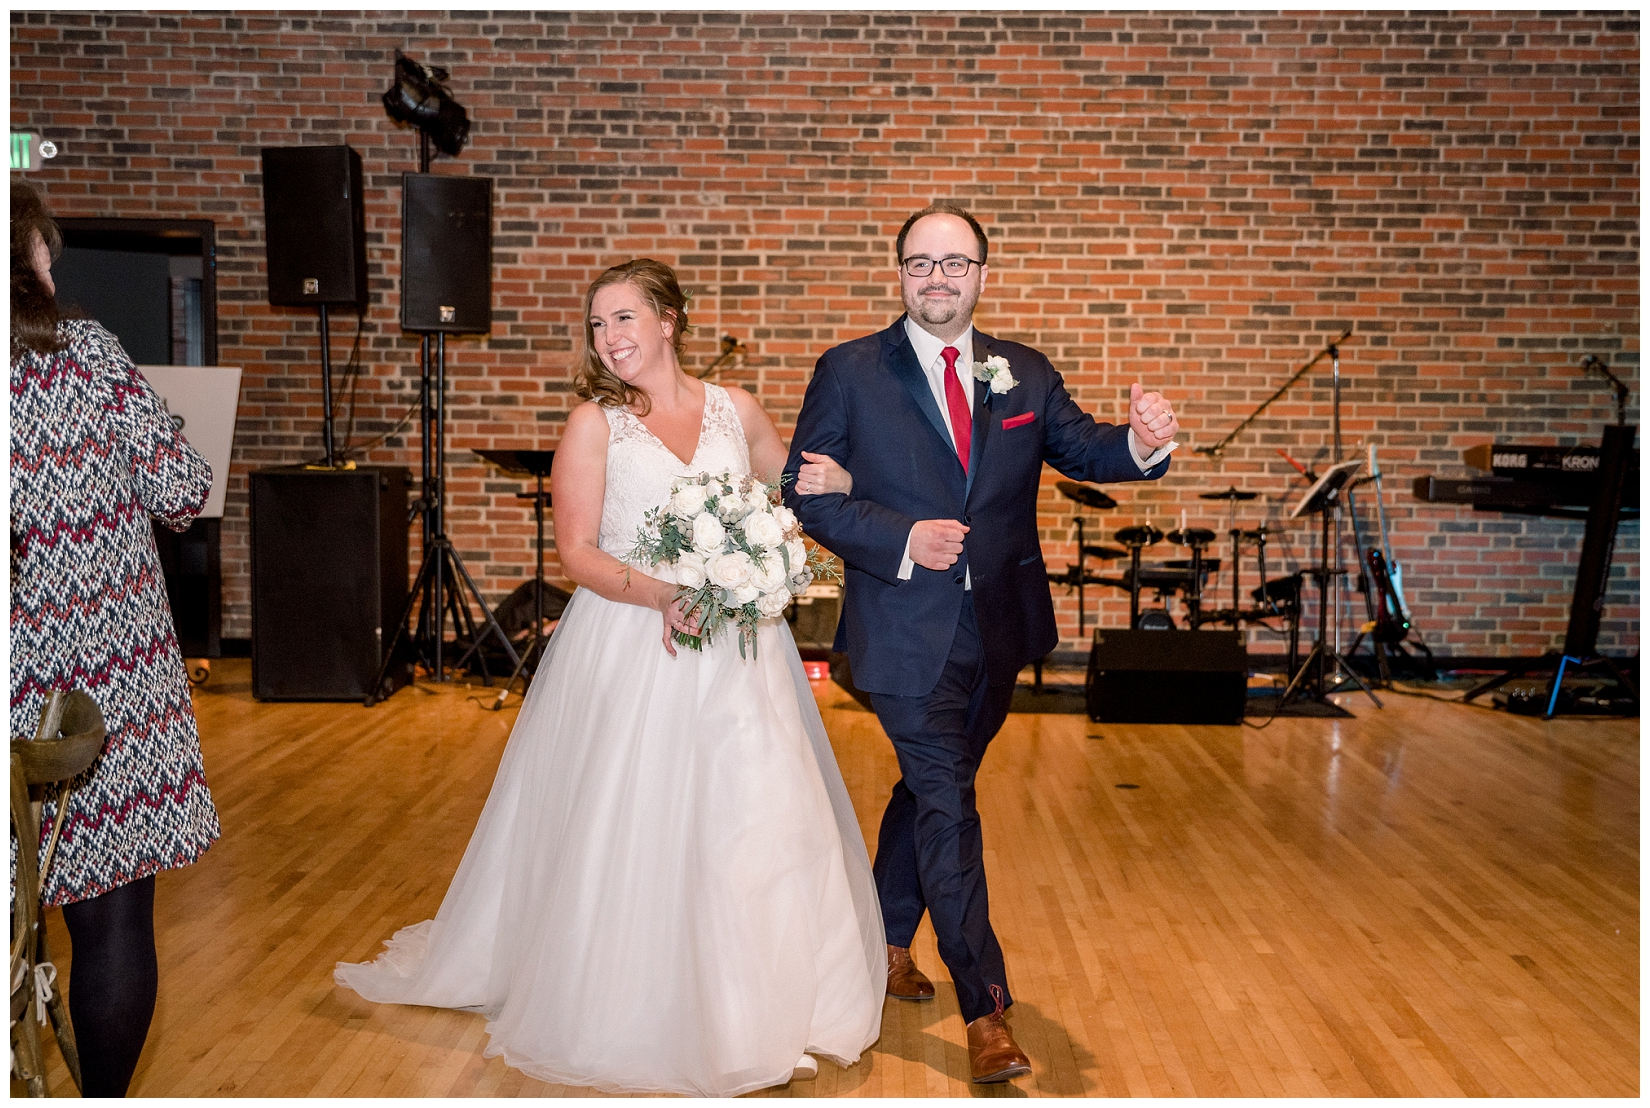 cat-alkire-wedding-photographer-indiana-chicago-indianapolis-fort-wayne_0989.jpg